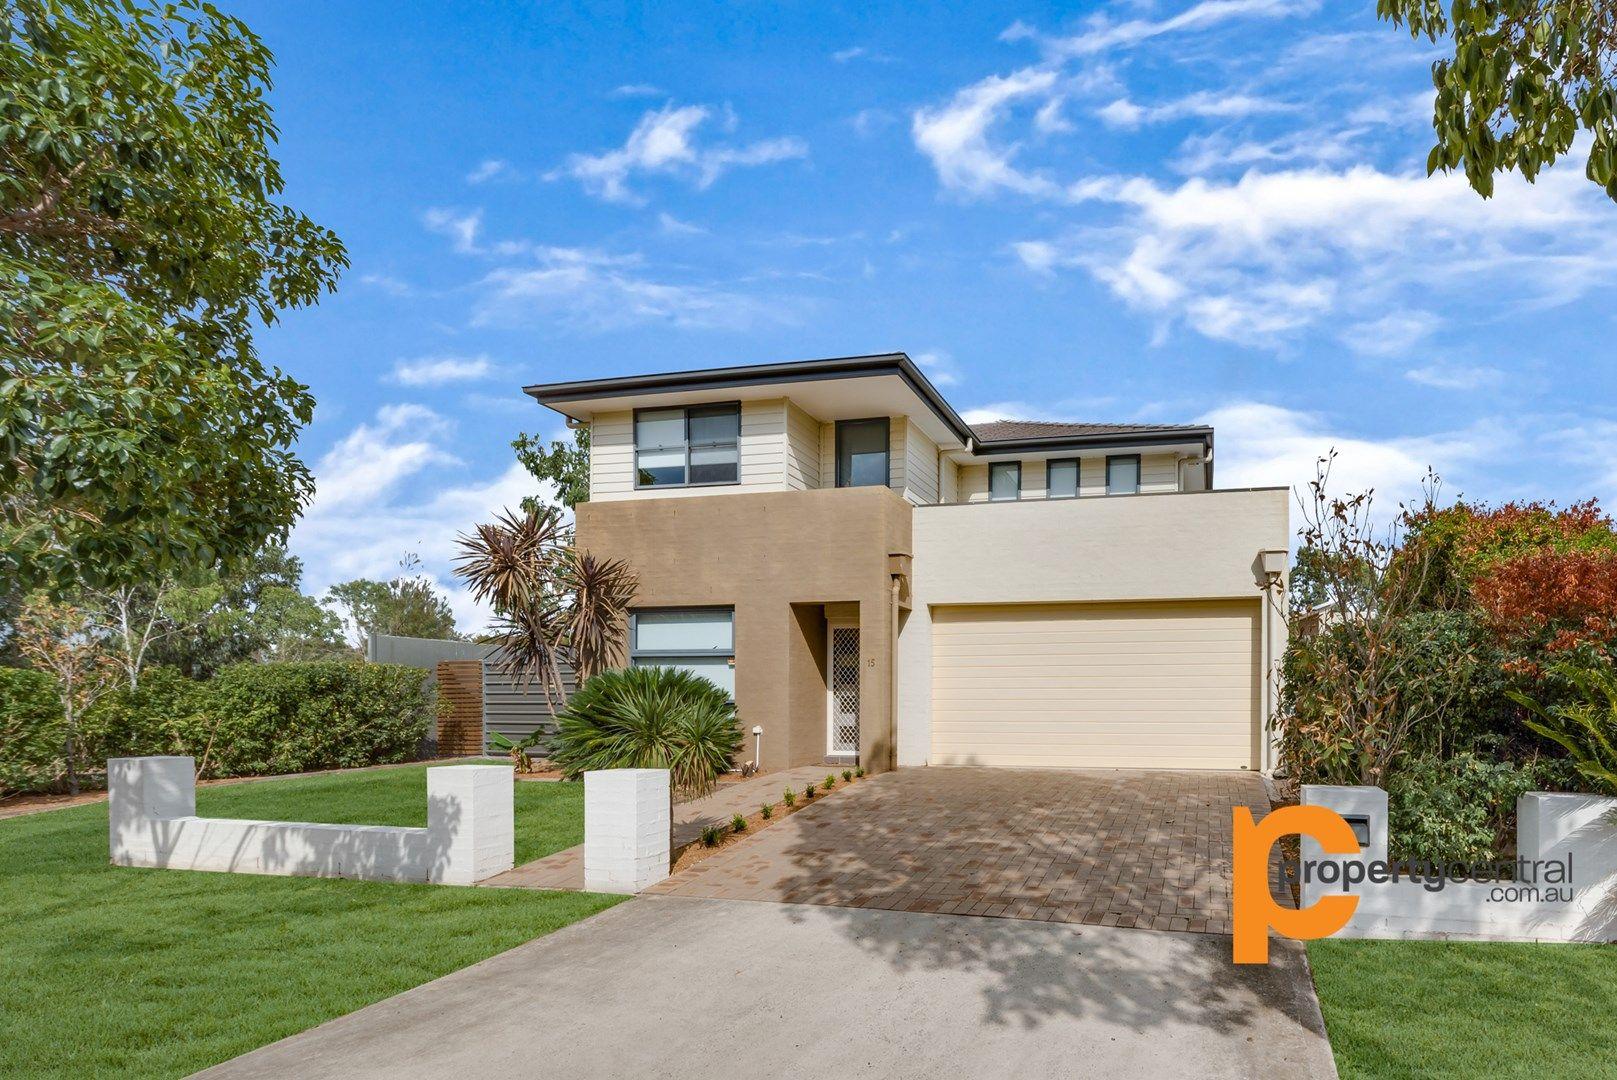 15 Gannet Drive, Cranebrook NSW 2749, Image 0